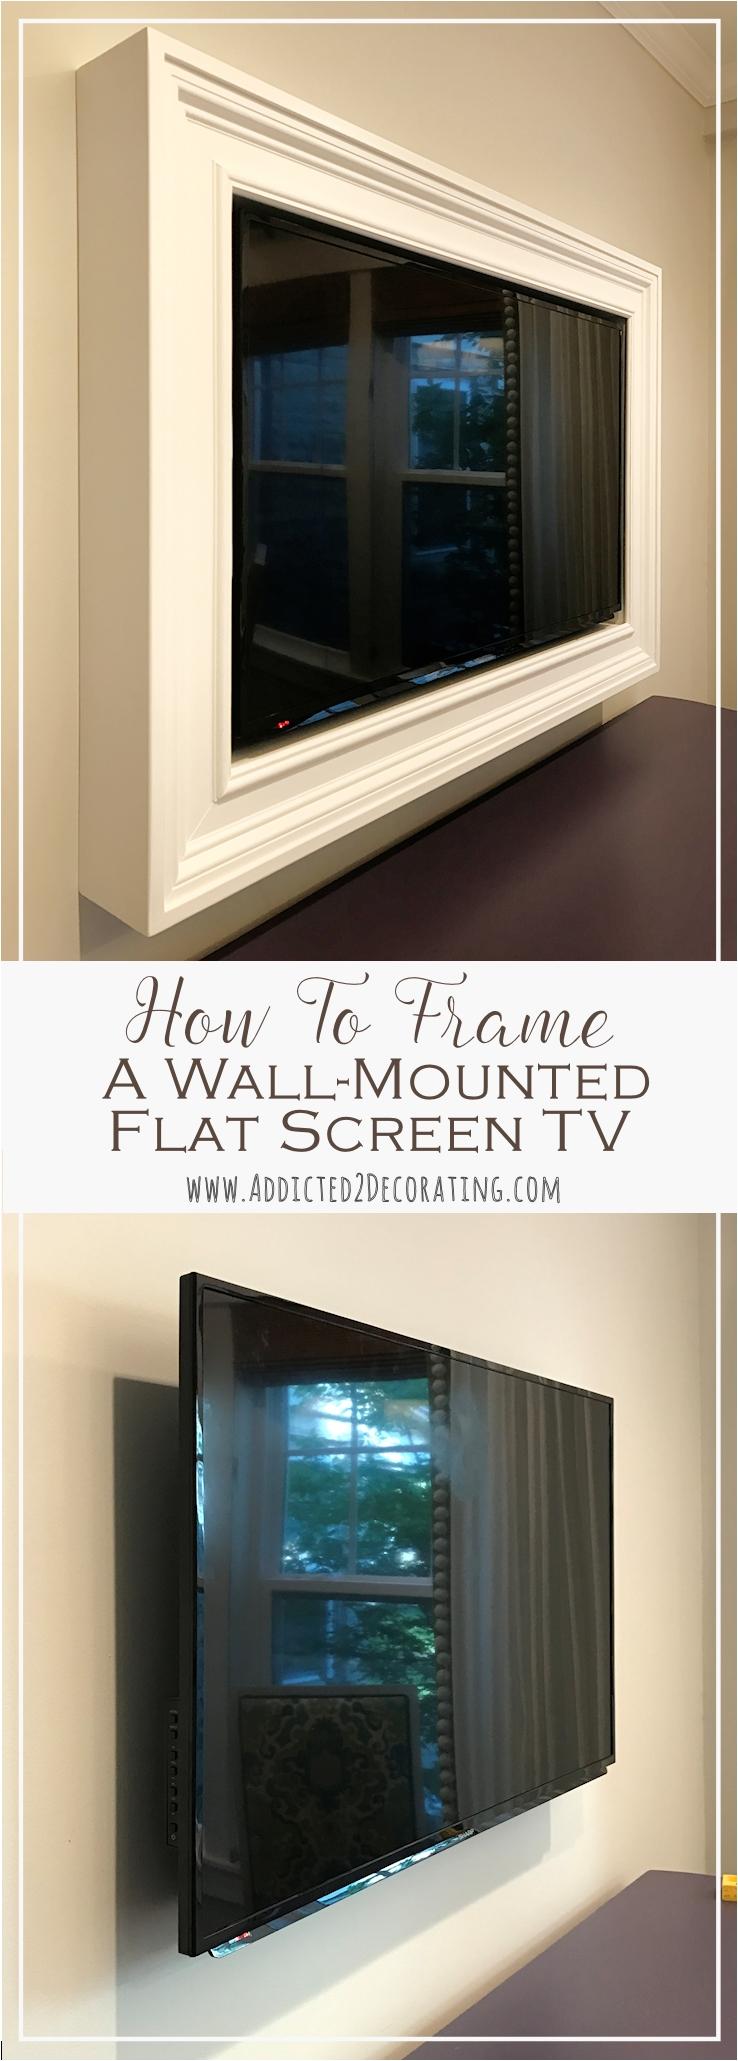 Decorative Cord Covers Flat Screen Tv Custom Diy Frame for Wall ...